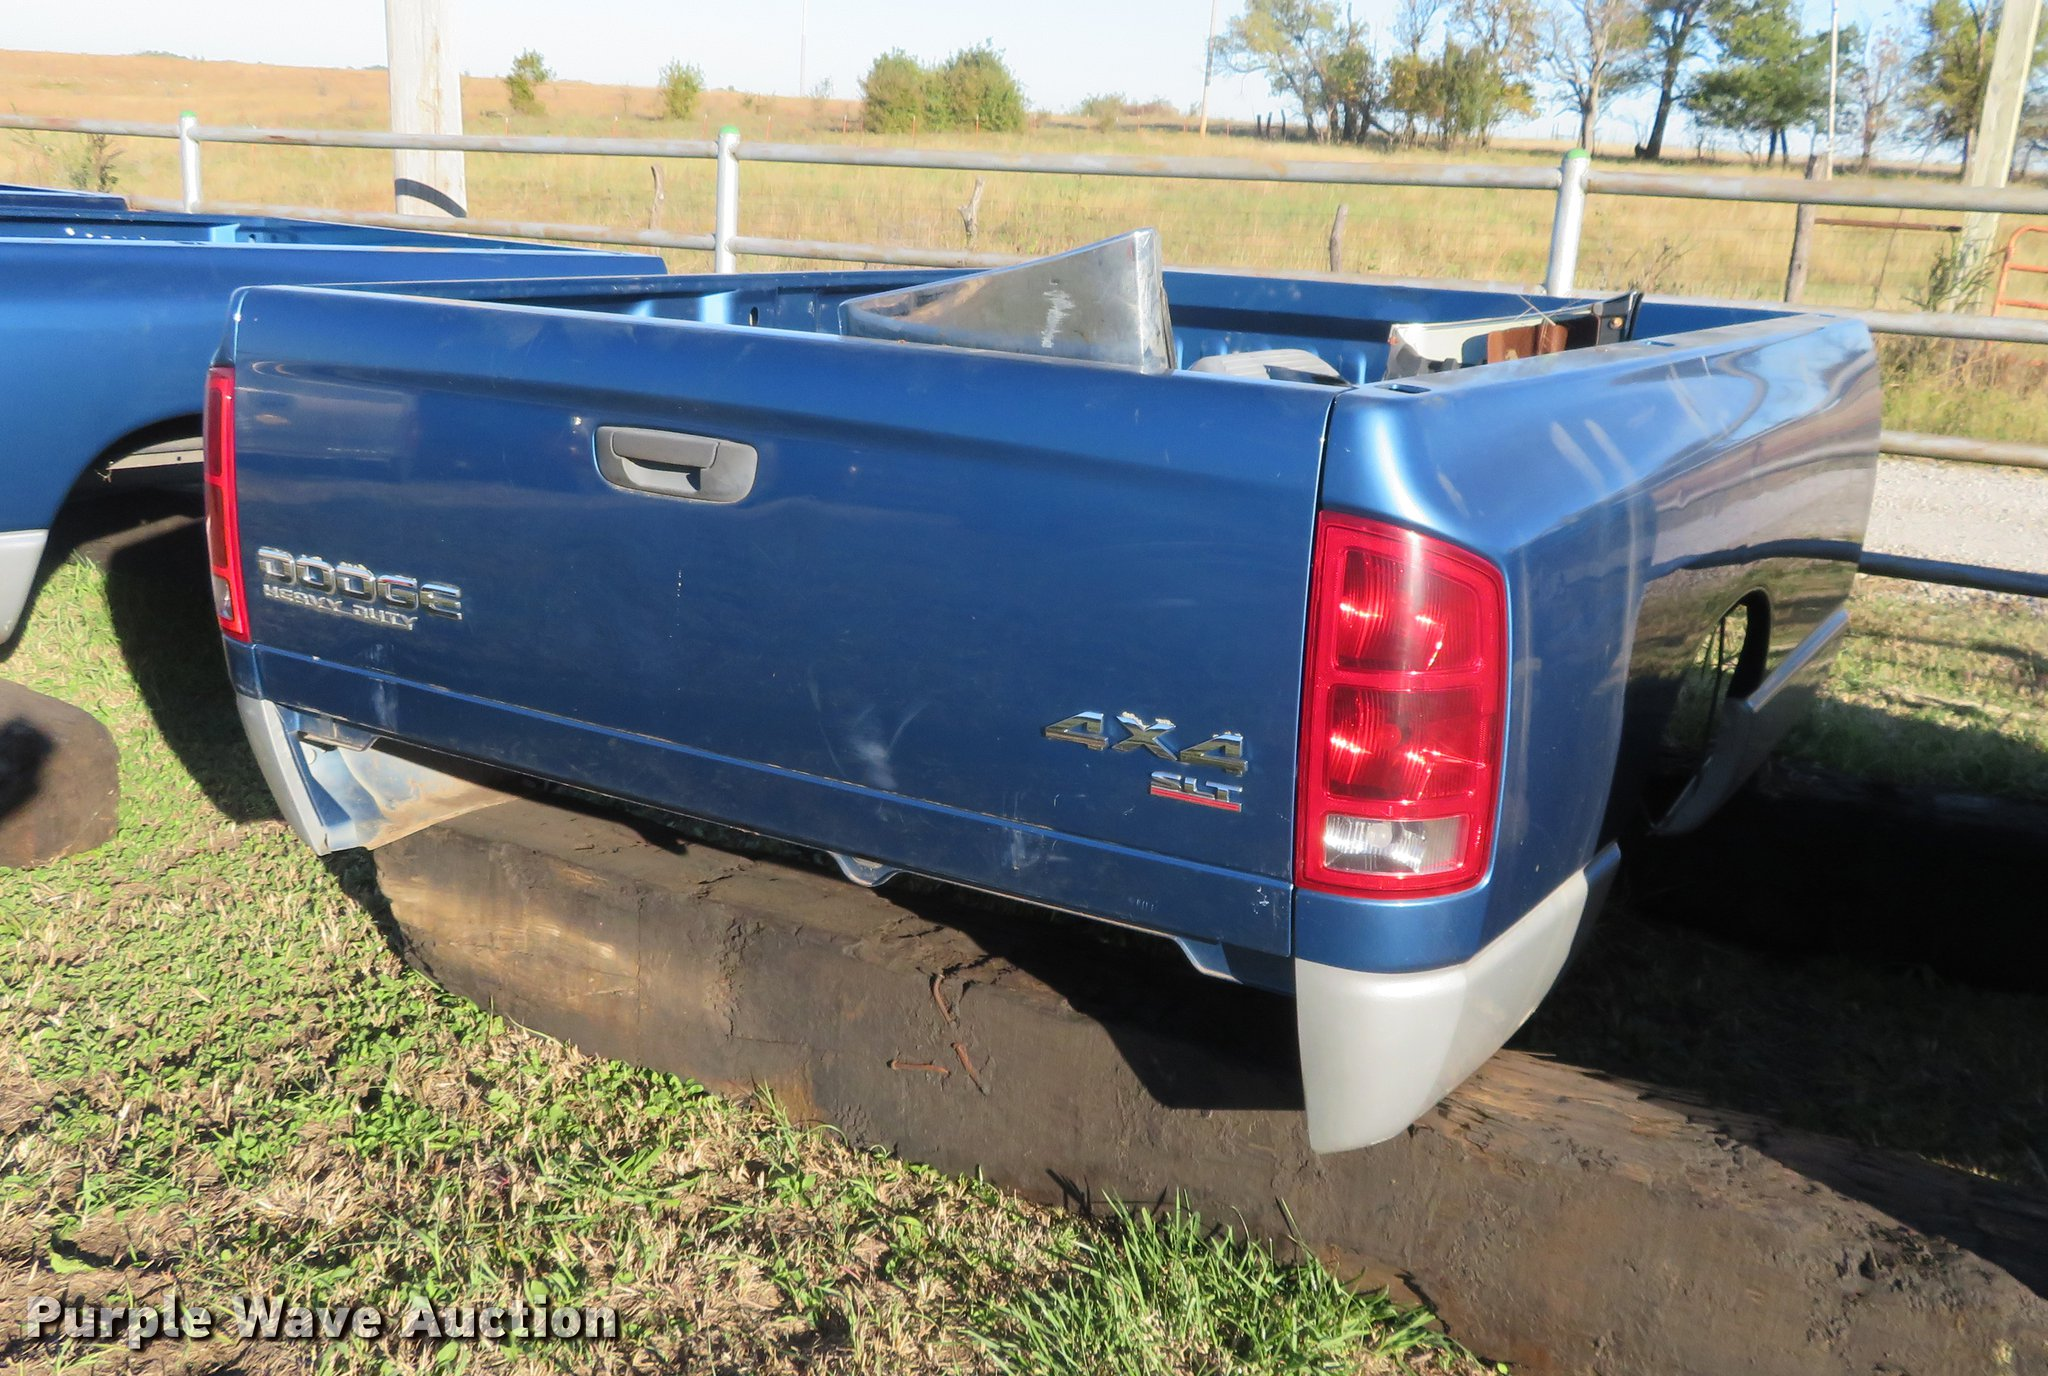 Dodge Ram Truck Bed For Sale >> 2004 Dodge Ram Pickup Truck Bed Item Df9796 11 30 2017